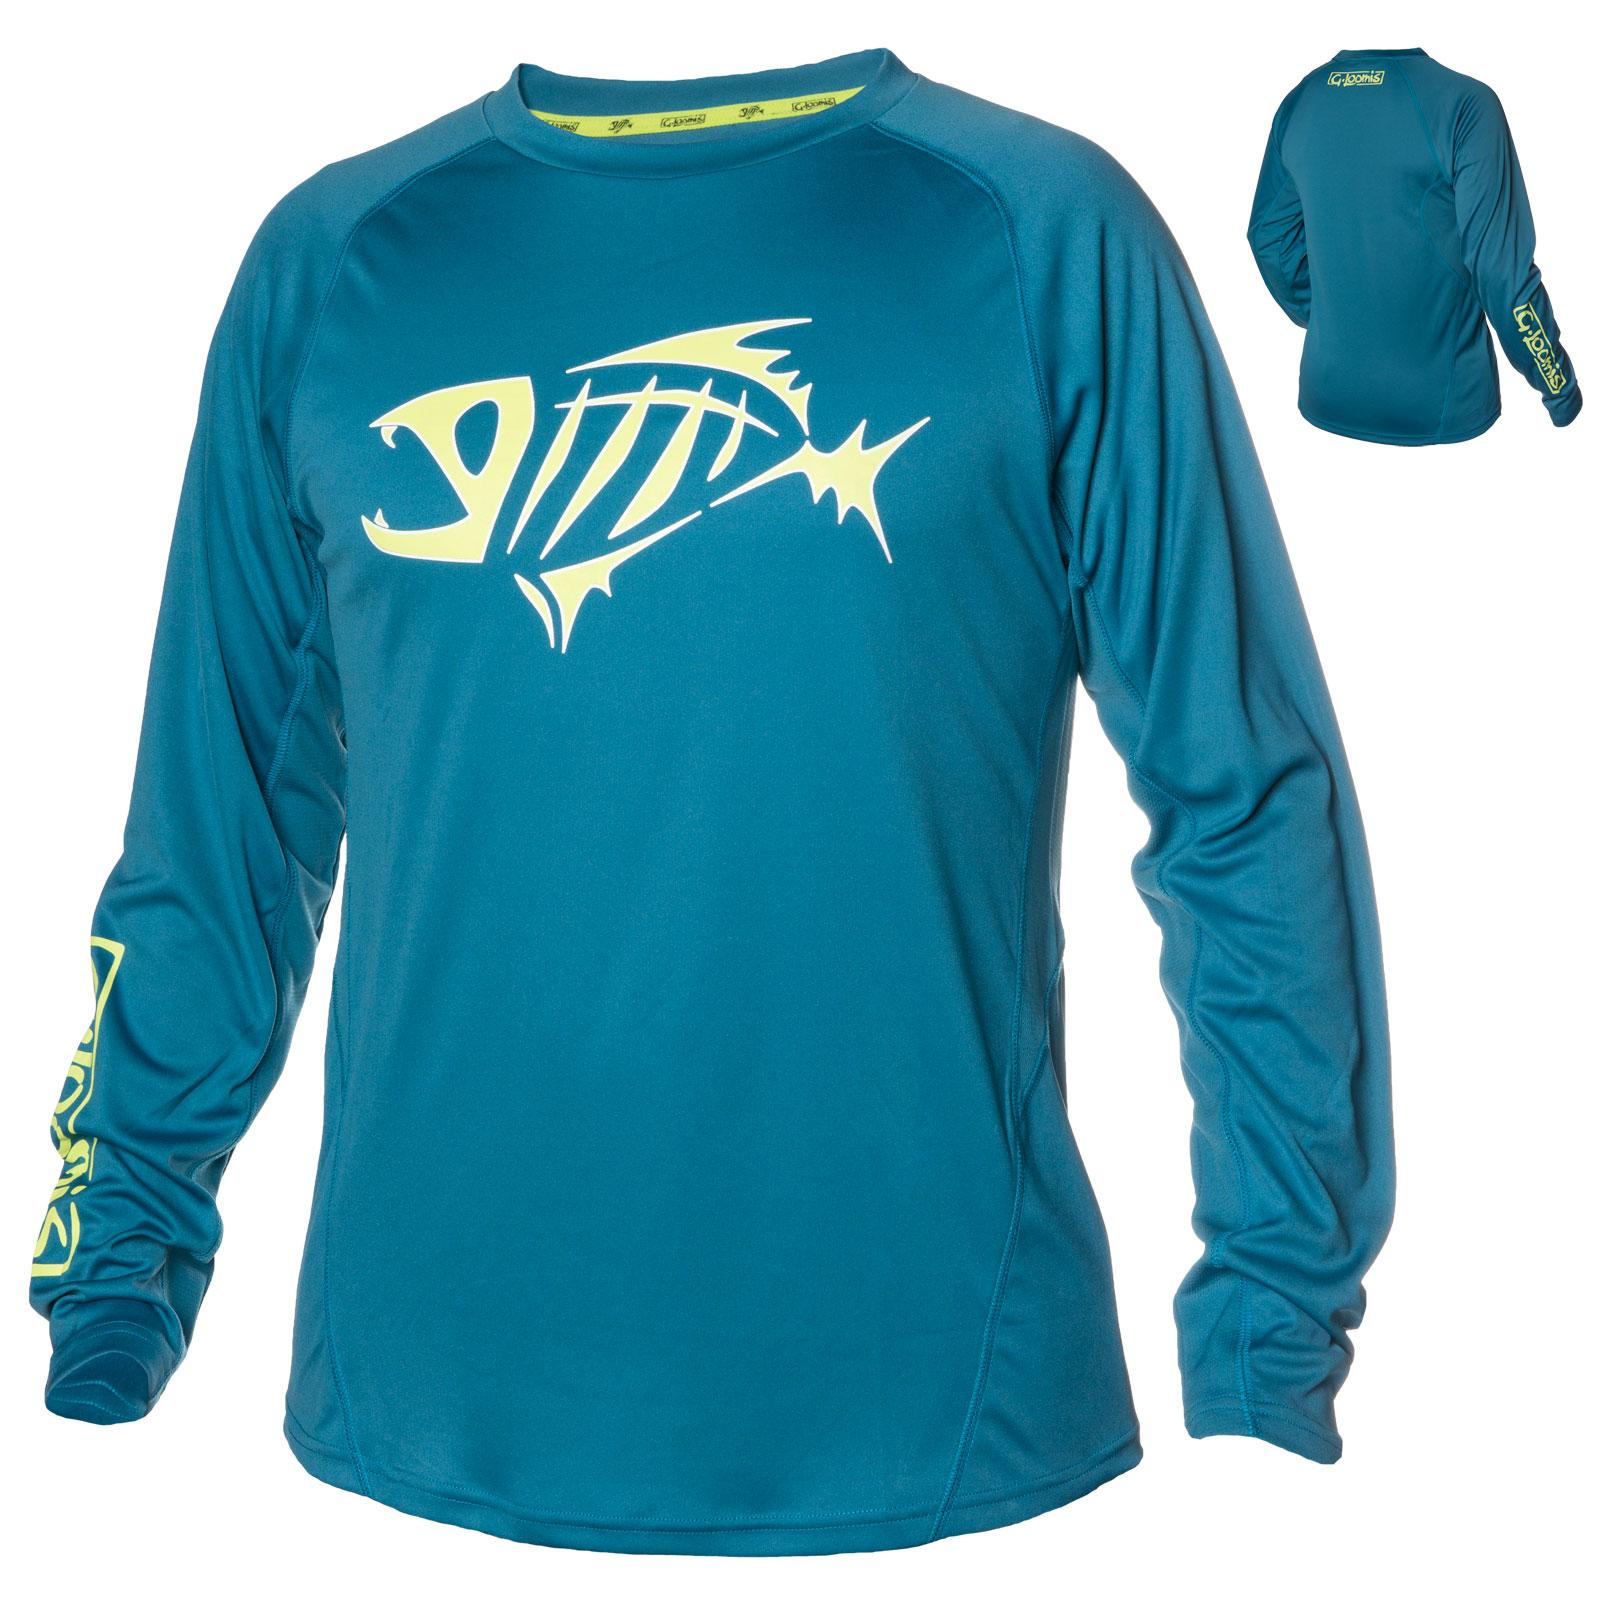 G loomis skeleton fish logo urso long sleeve uv protective for Uv fishing shirts